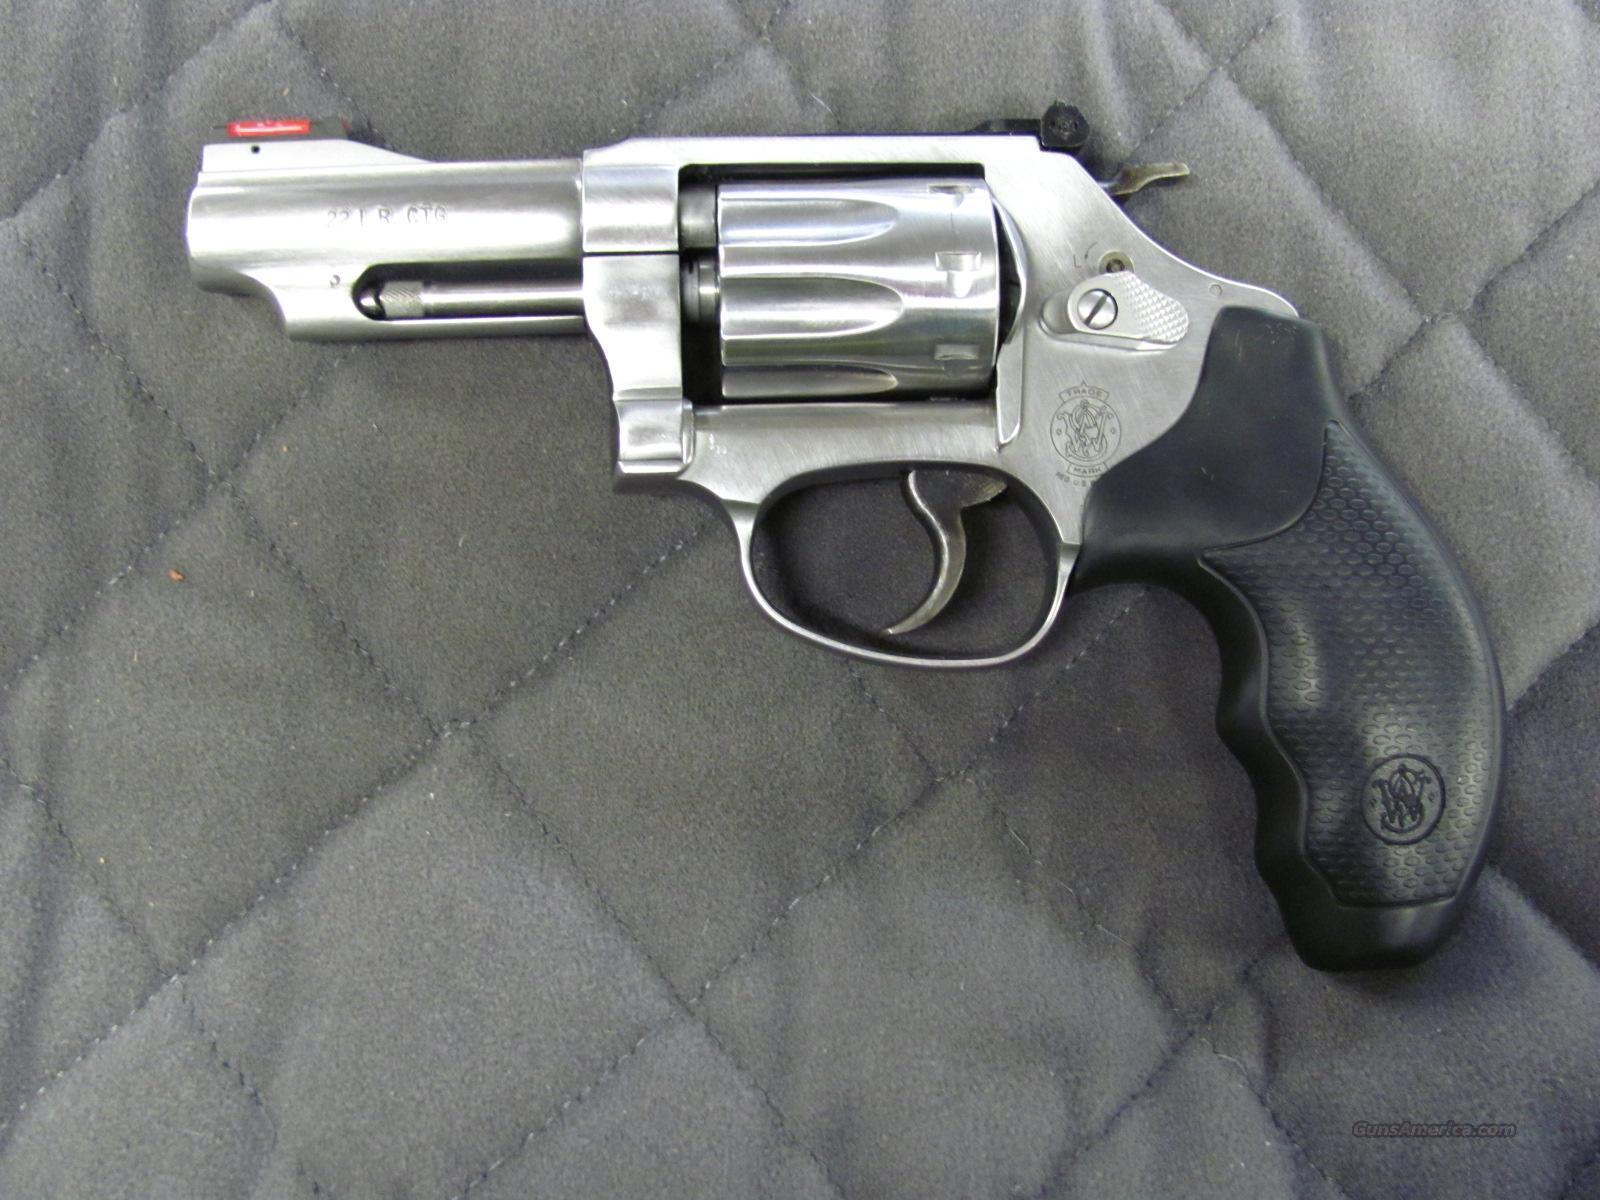 Smith & Wesson Model 63 22 Long Rifle  **NEW** 162634  Guns > Pistols > Smith & Wesson Revolvers > Pocket Pistols